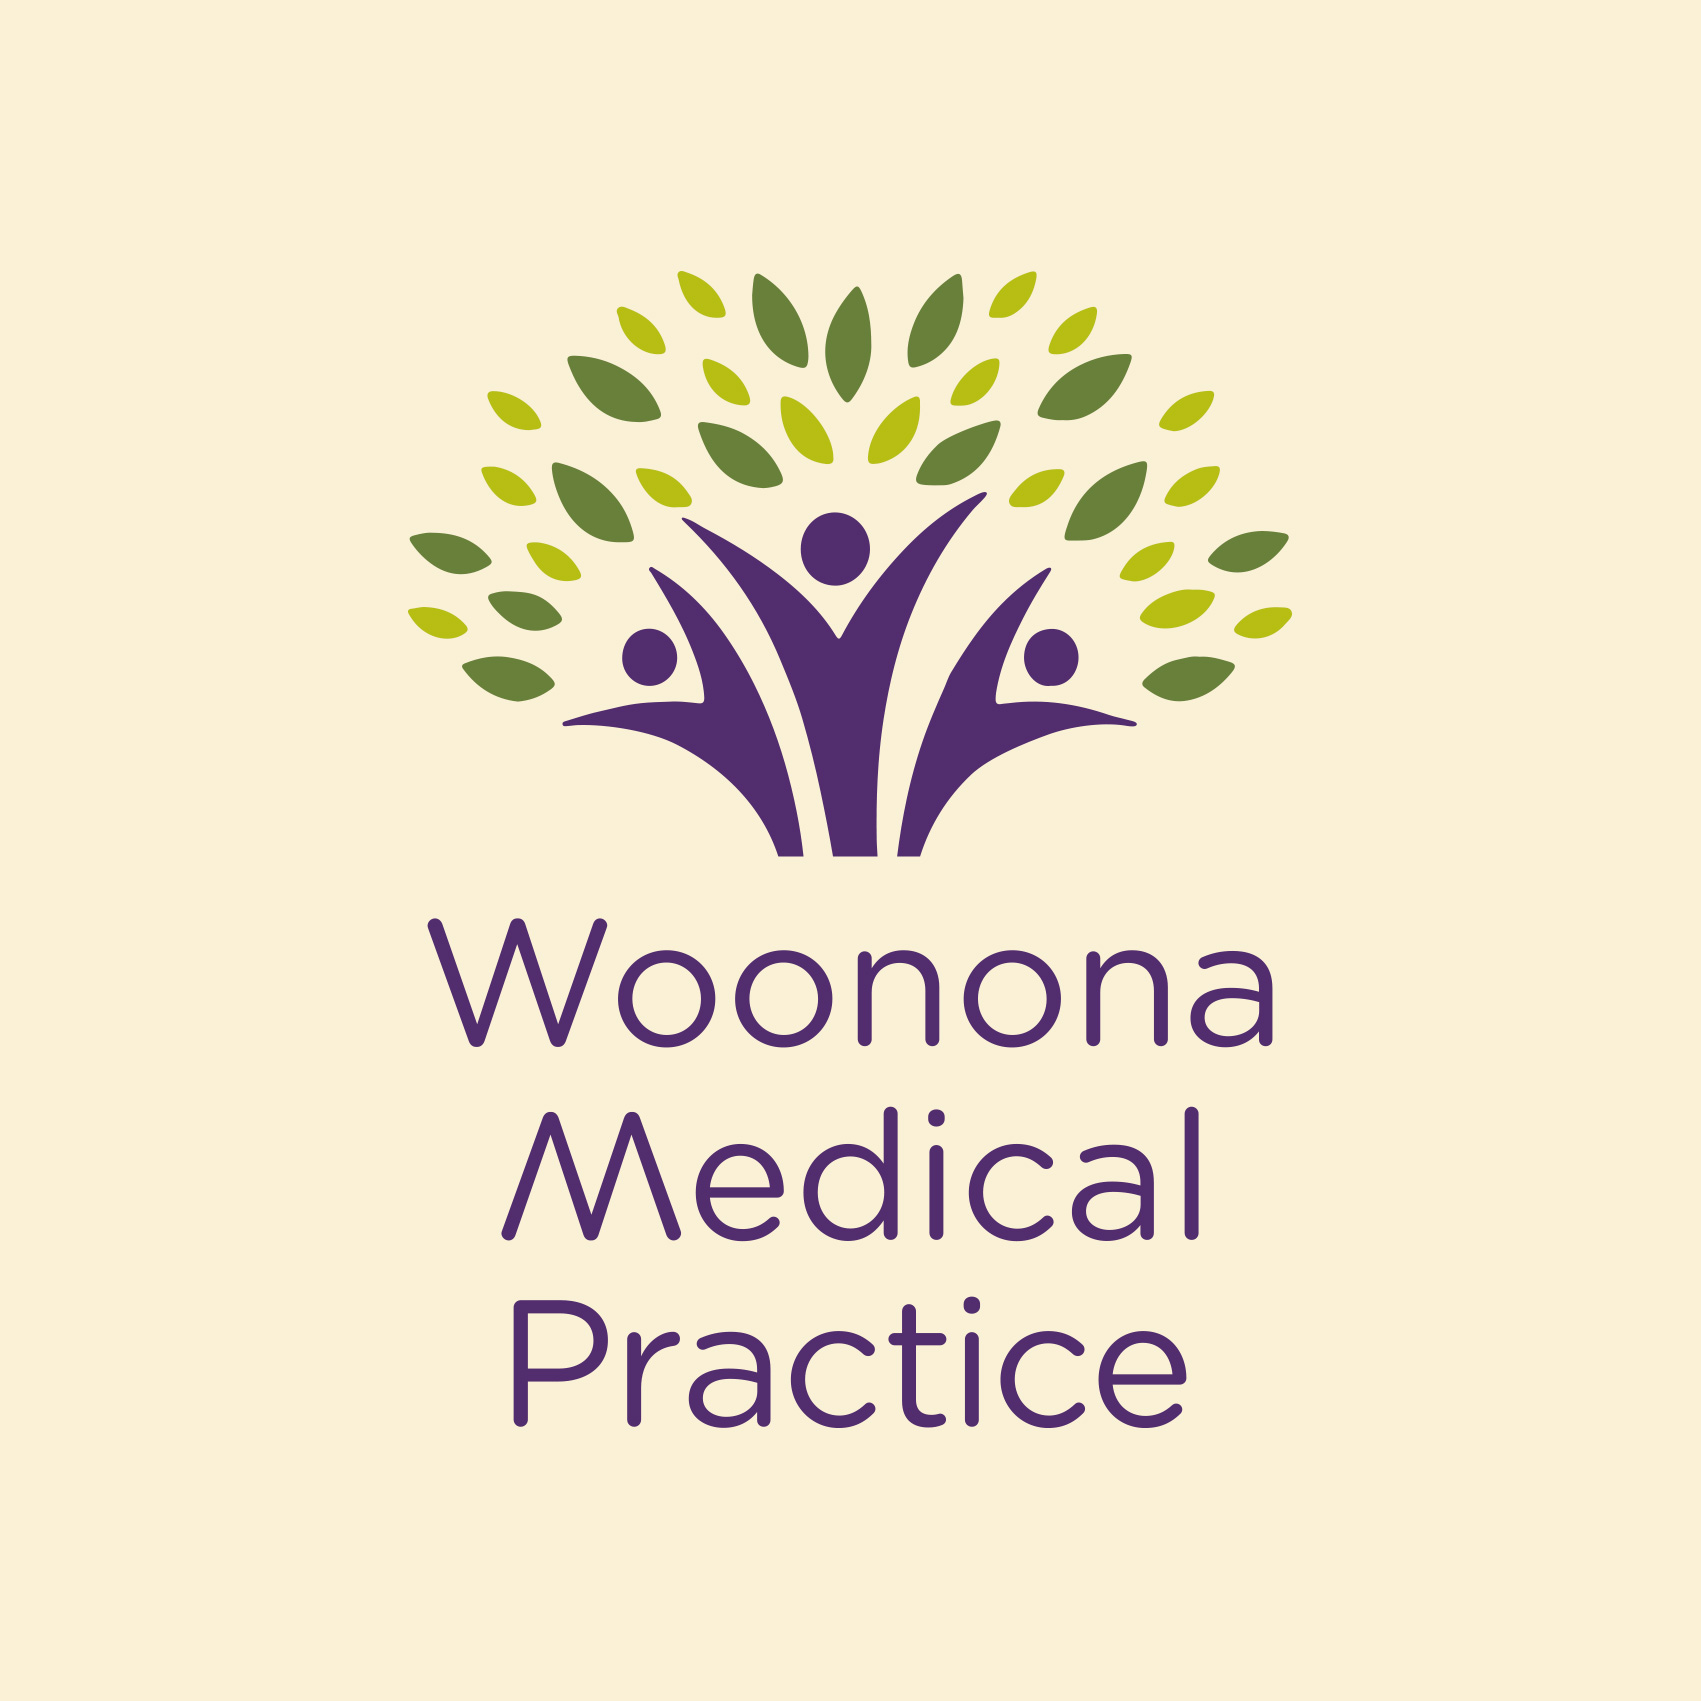 wollgonong-graphic-design-visual-energy-branding-woonona-medical-.jpg